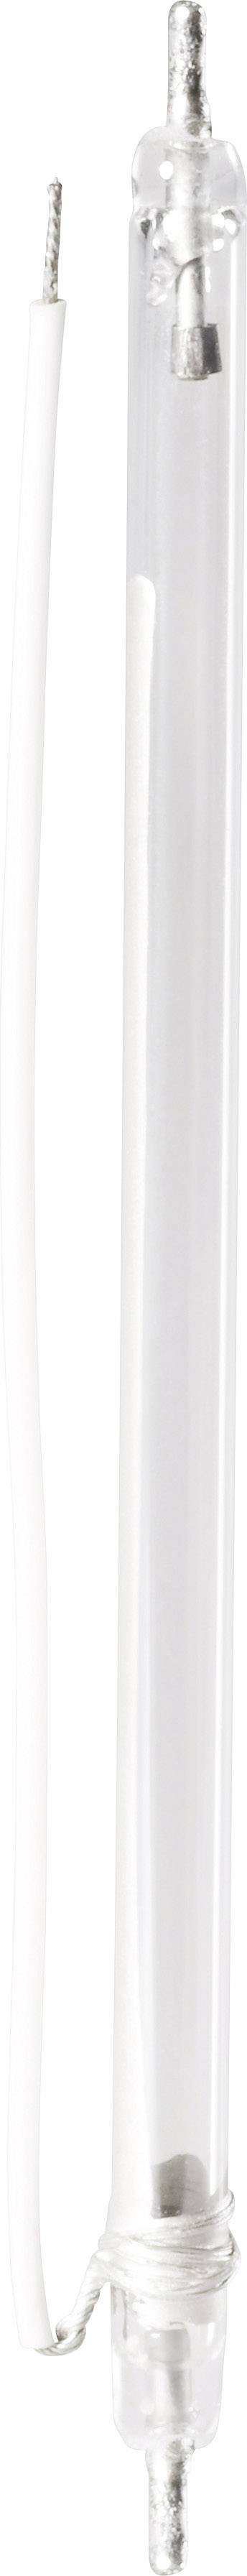 Výbojkastroboskopu Eurolite E3071510, biela